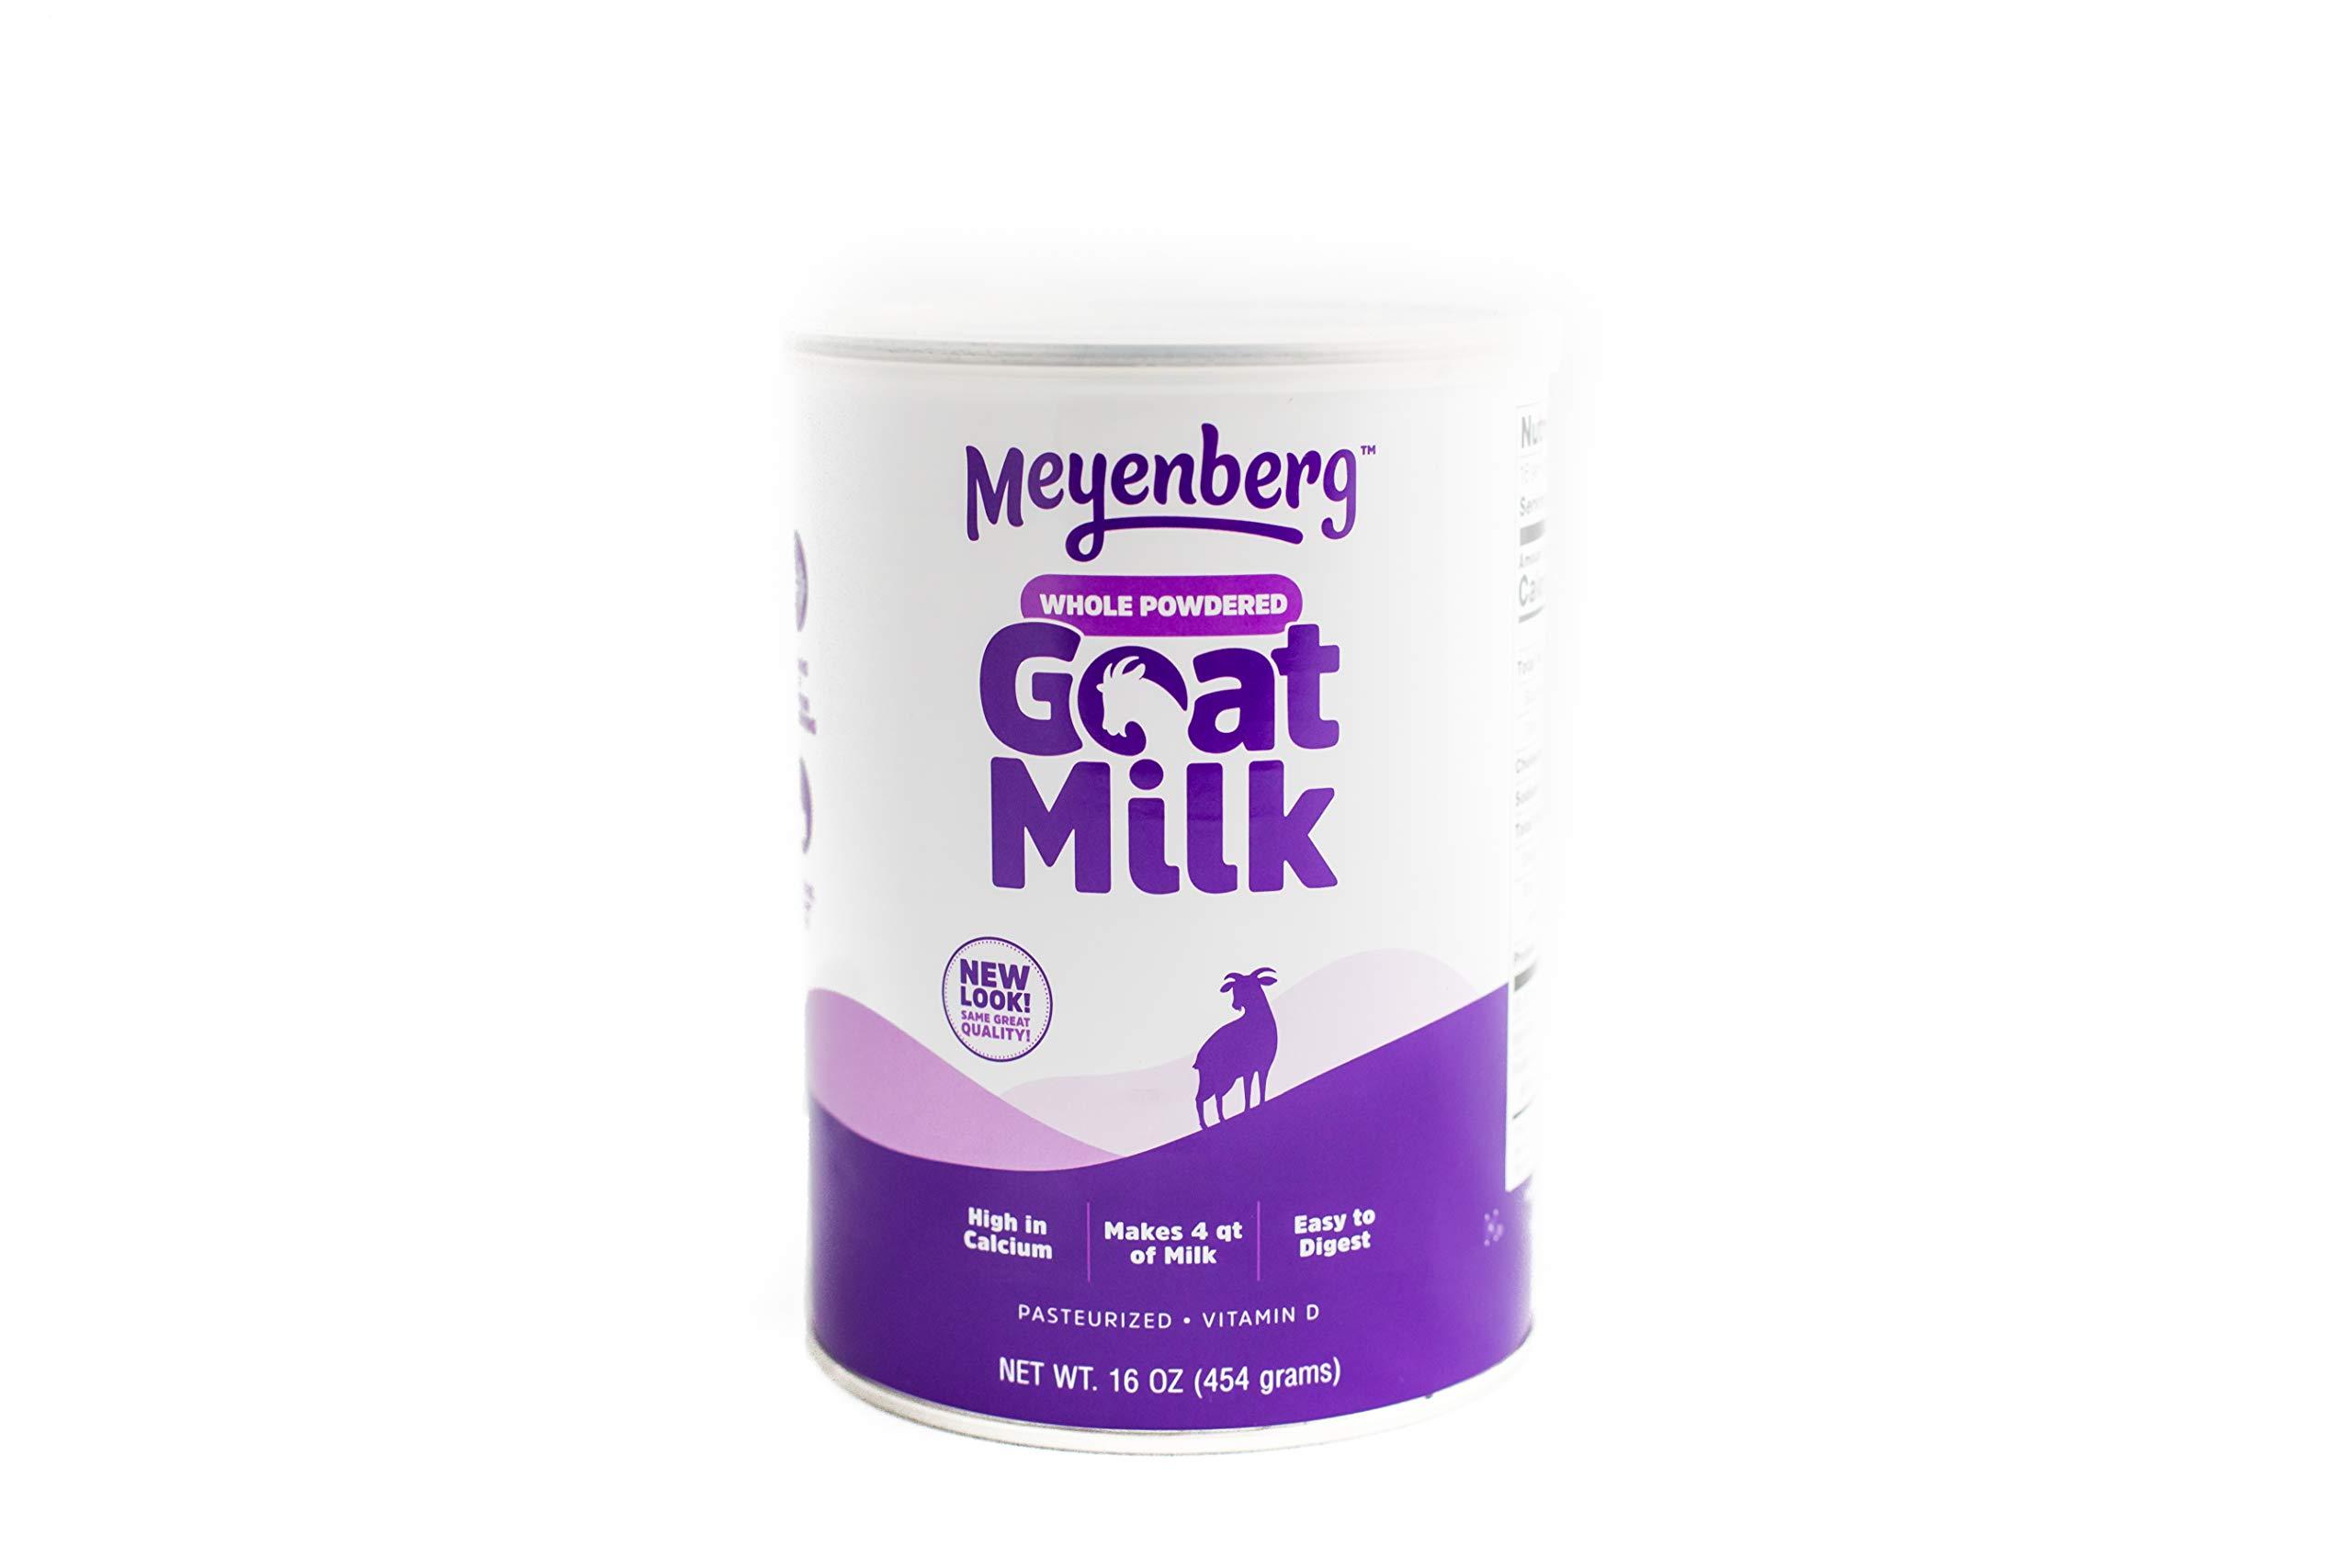 Meyenberg Canned Powdered Whole Goat Milk, Gluten Free, Soy Free, 16 oz